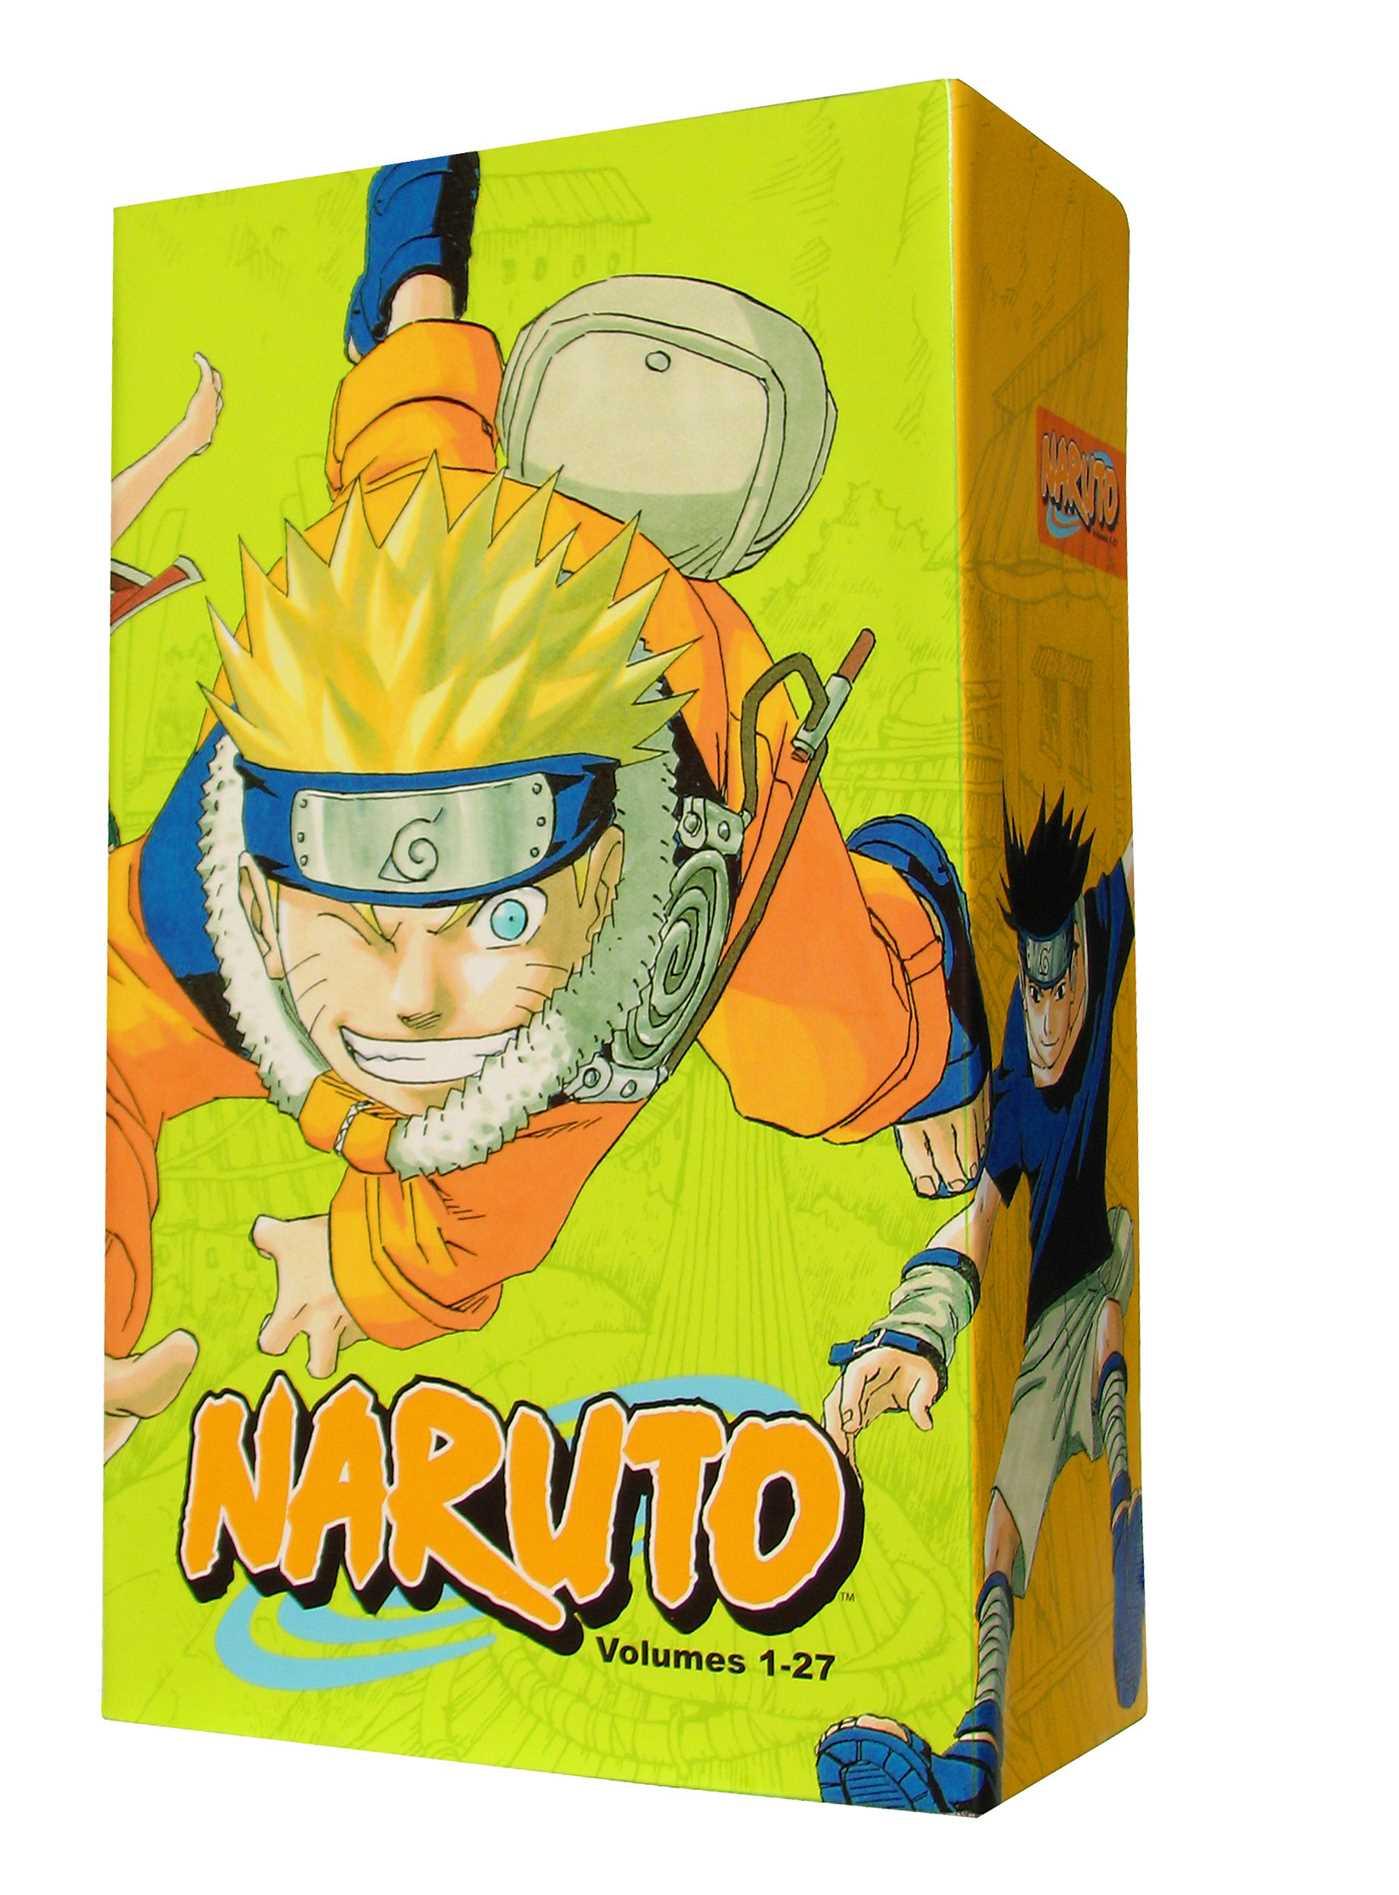 Naruto Box Set 1 : Volumes 1-27 with Premium